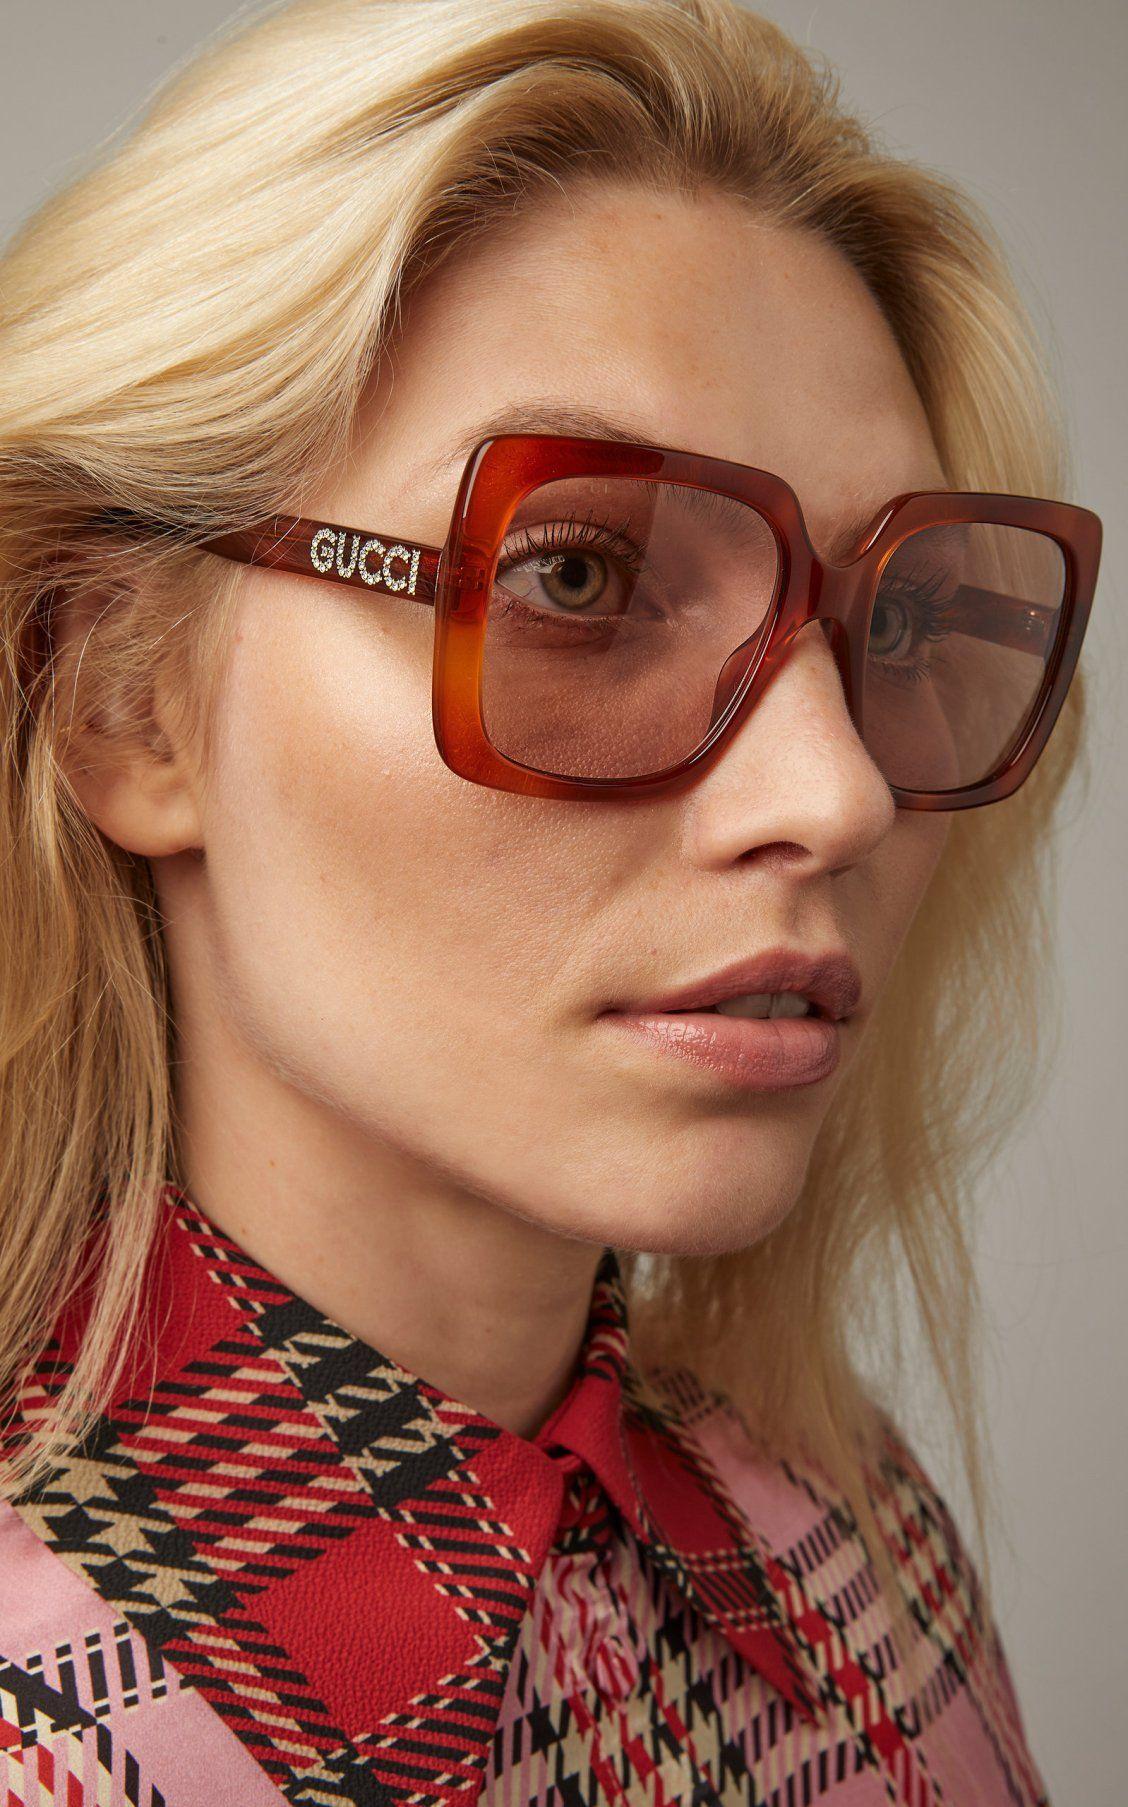 b079aec717 Gucci Sunglasses SS19